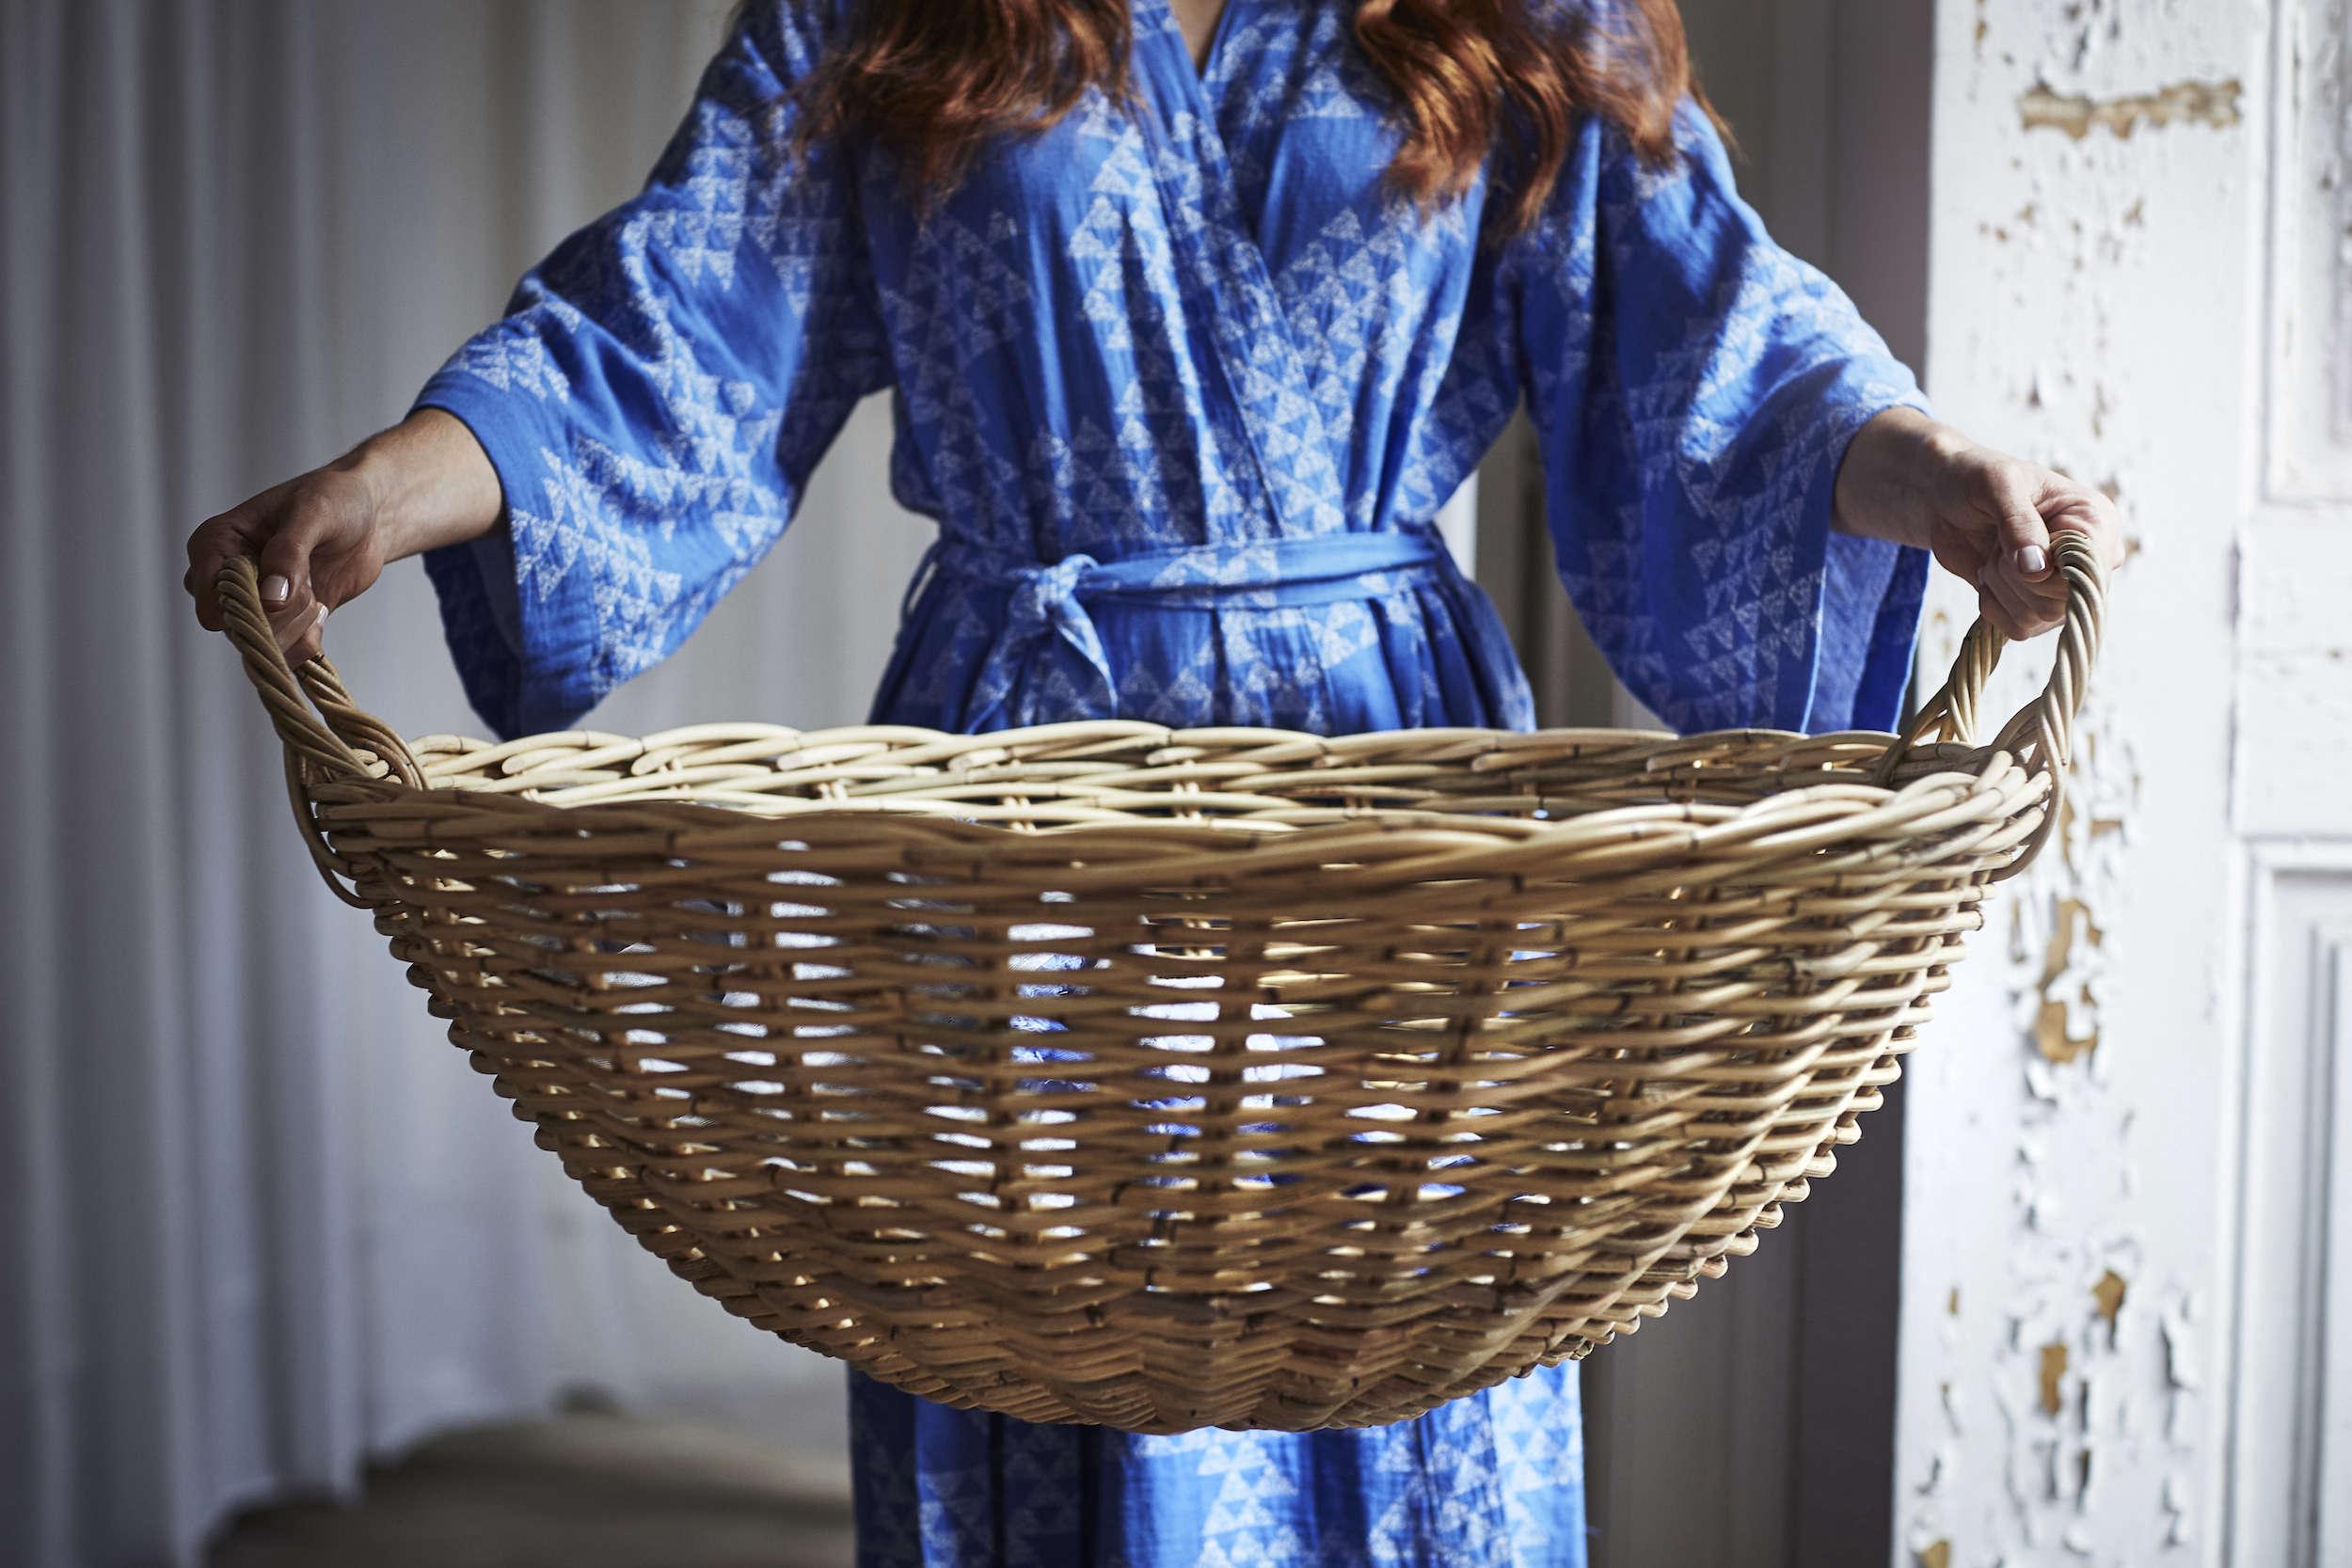 Ikea Tankvard Rattan Basket with Handles